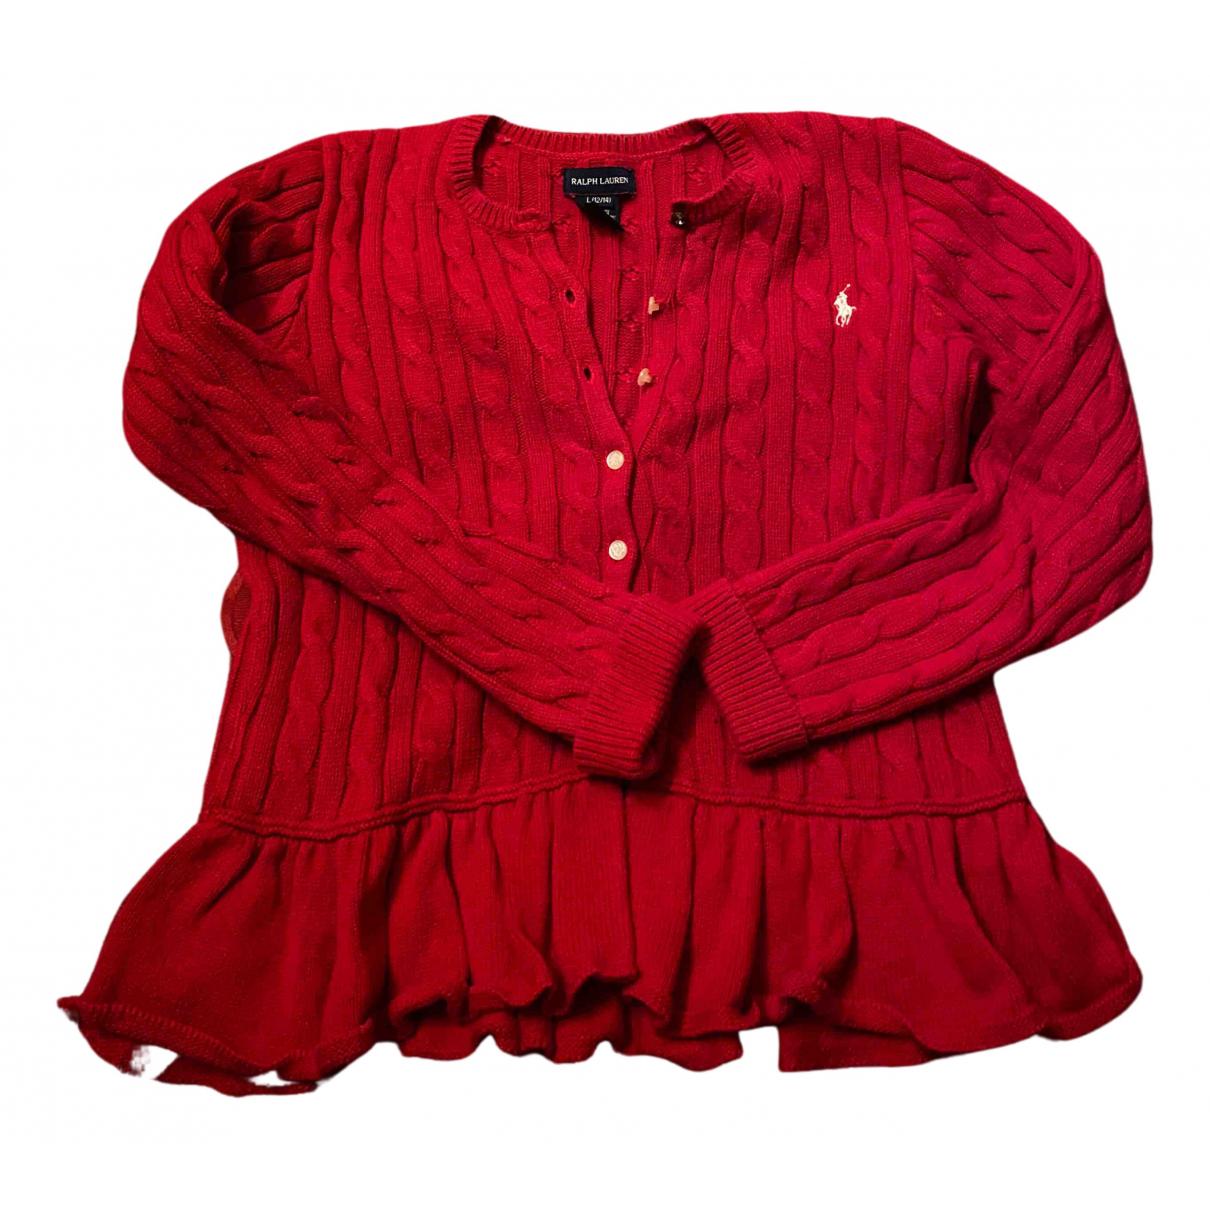 Ralph Lauren N Red Cotton Knitwear for Kids 18 years - L FR